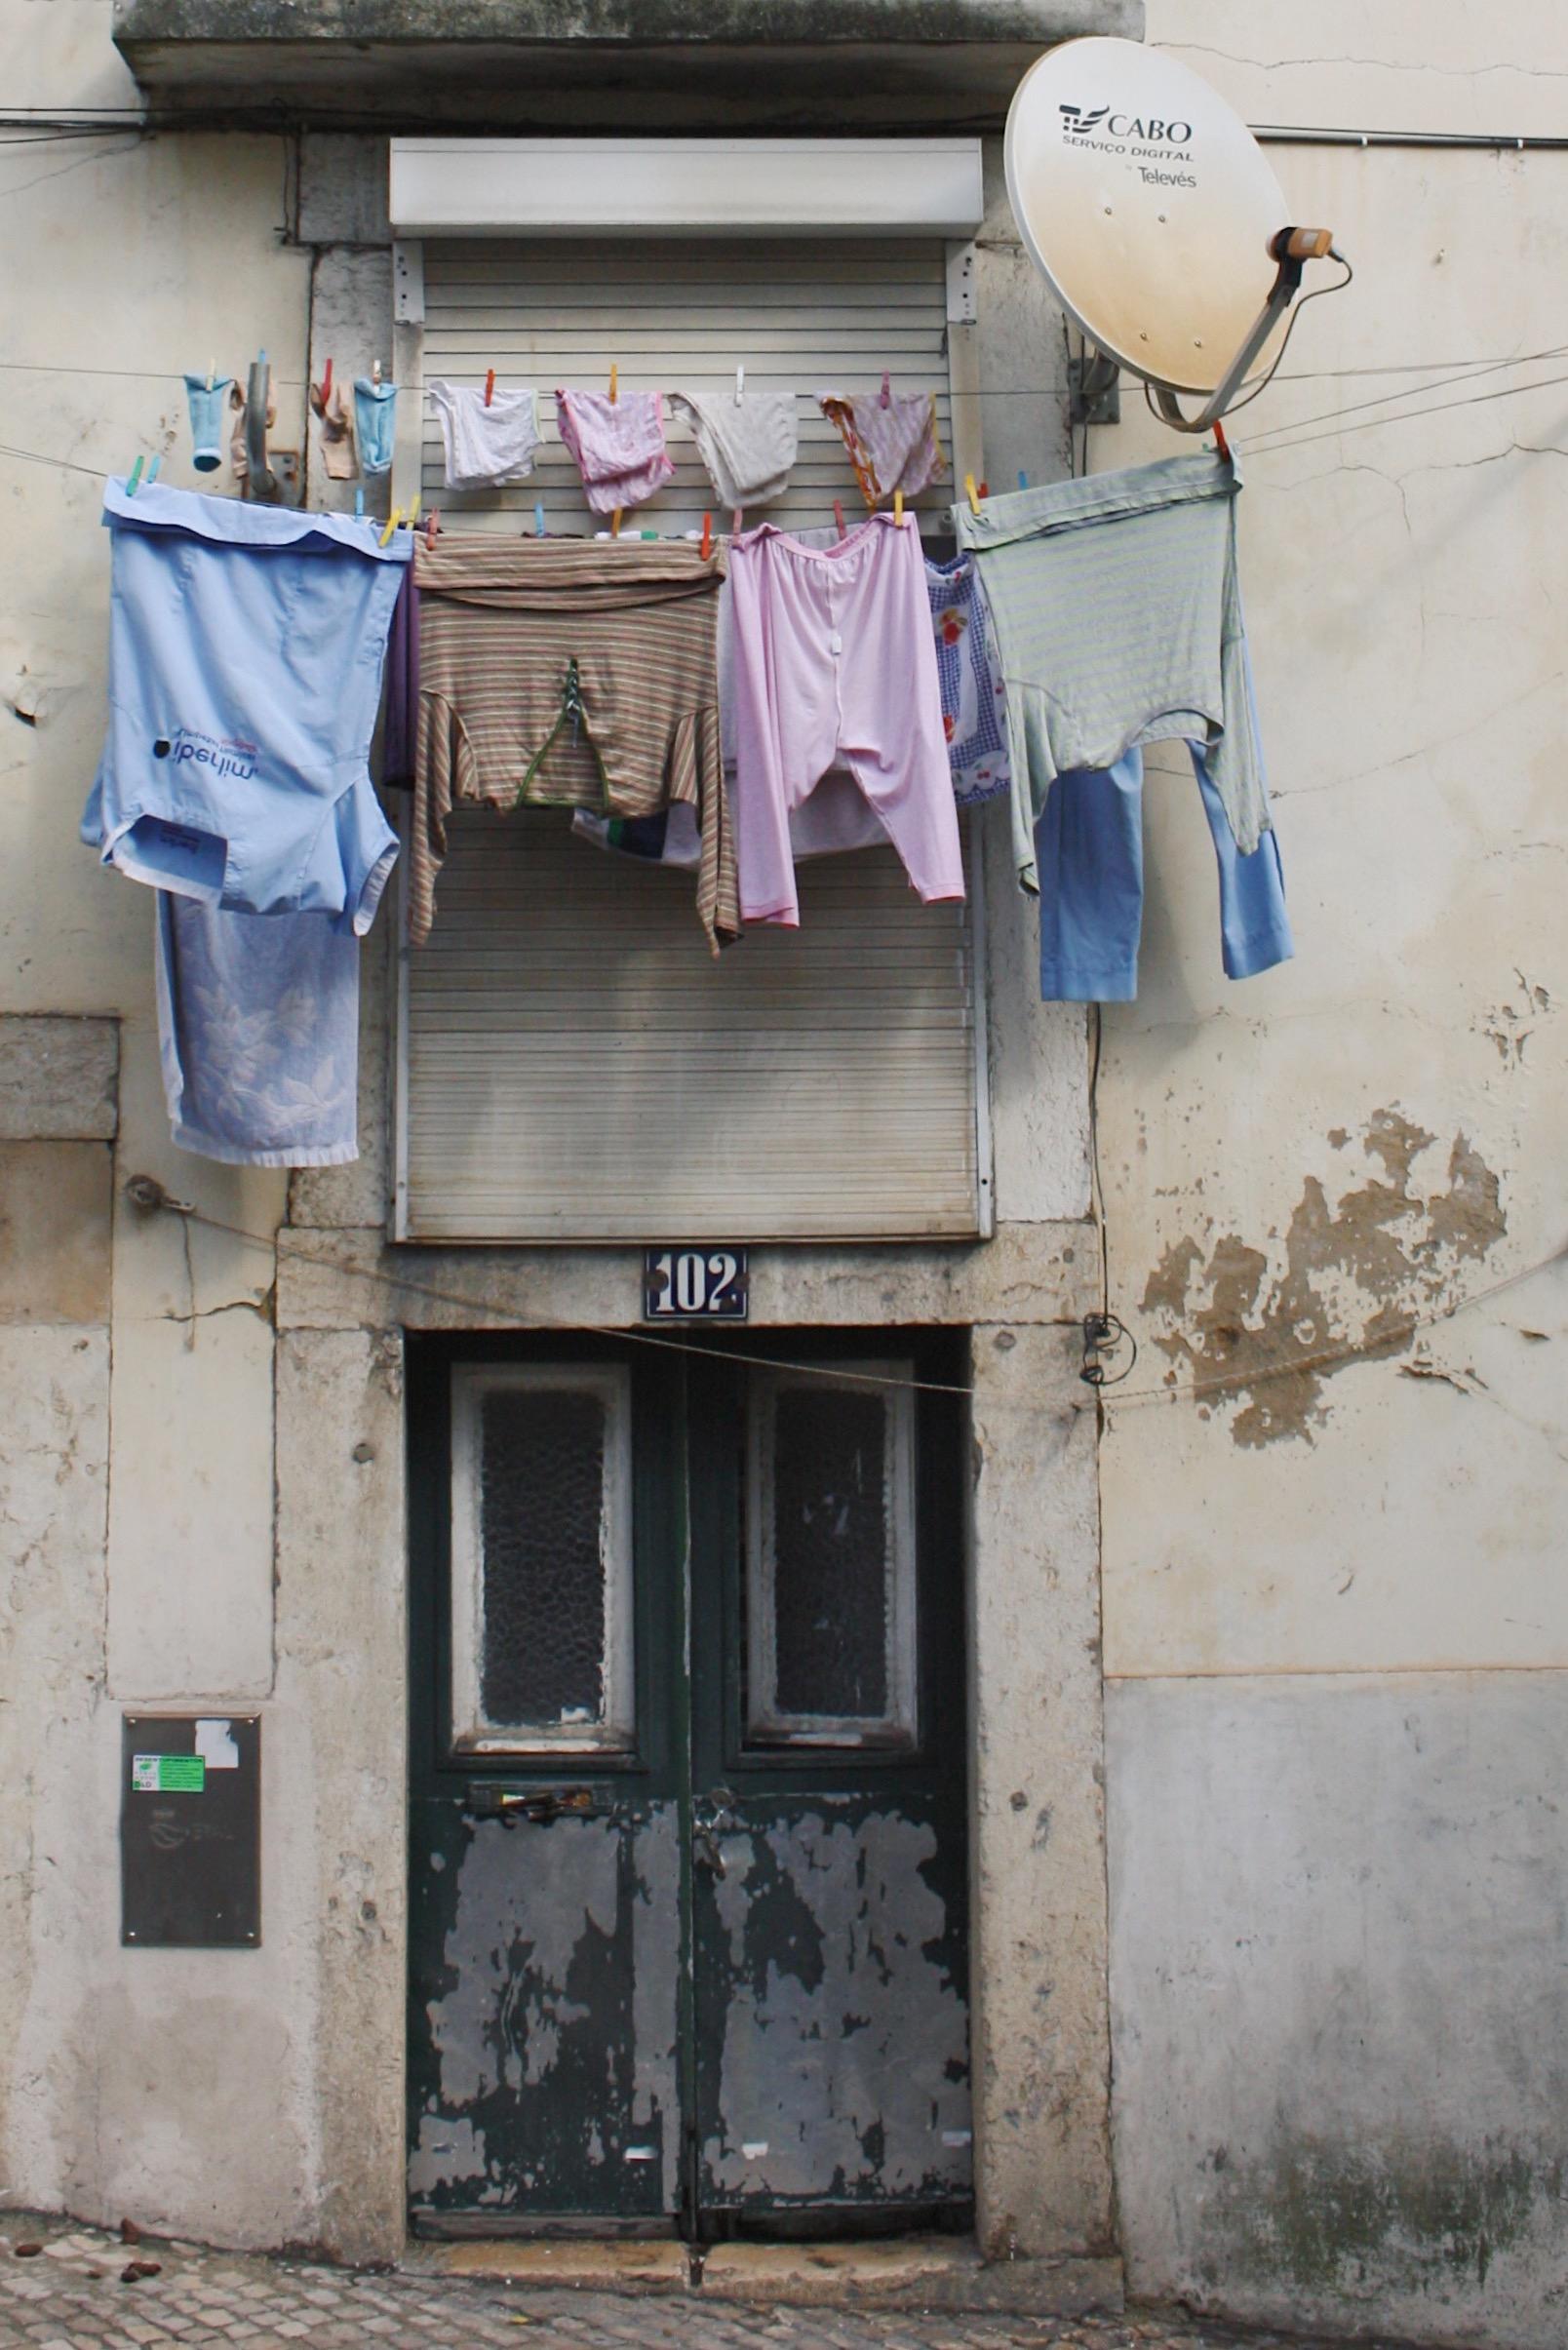 Credit: Yasumi    Location: Lisbon, Portugal